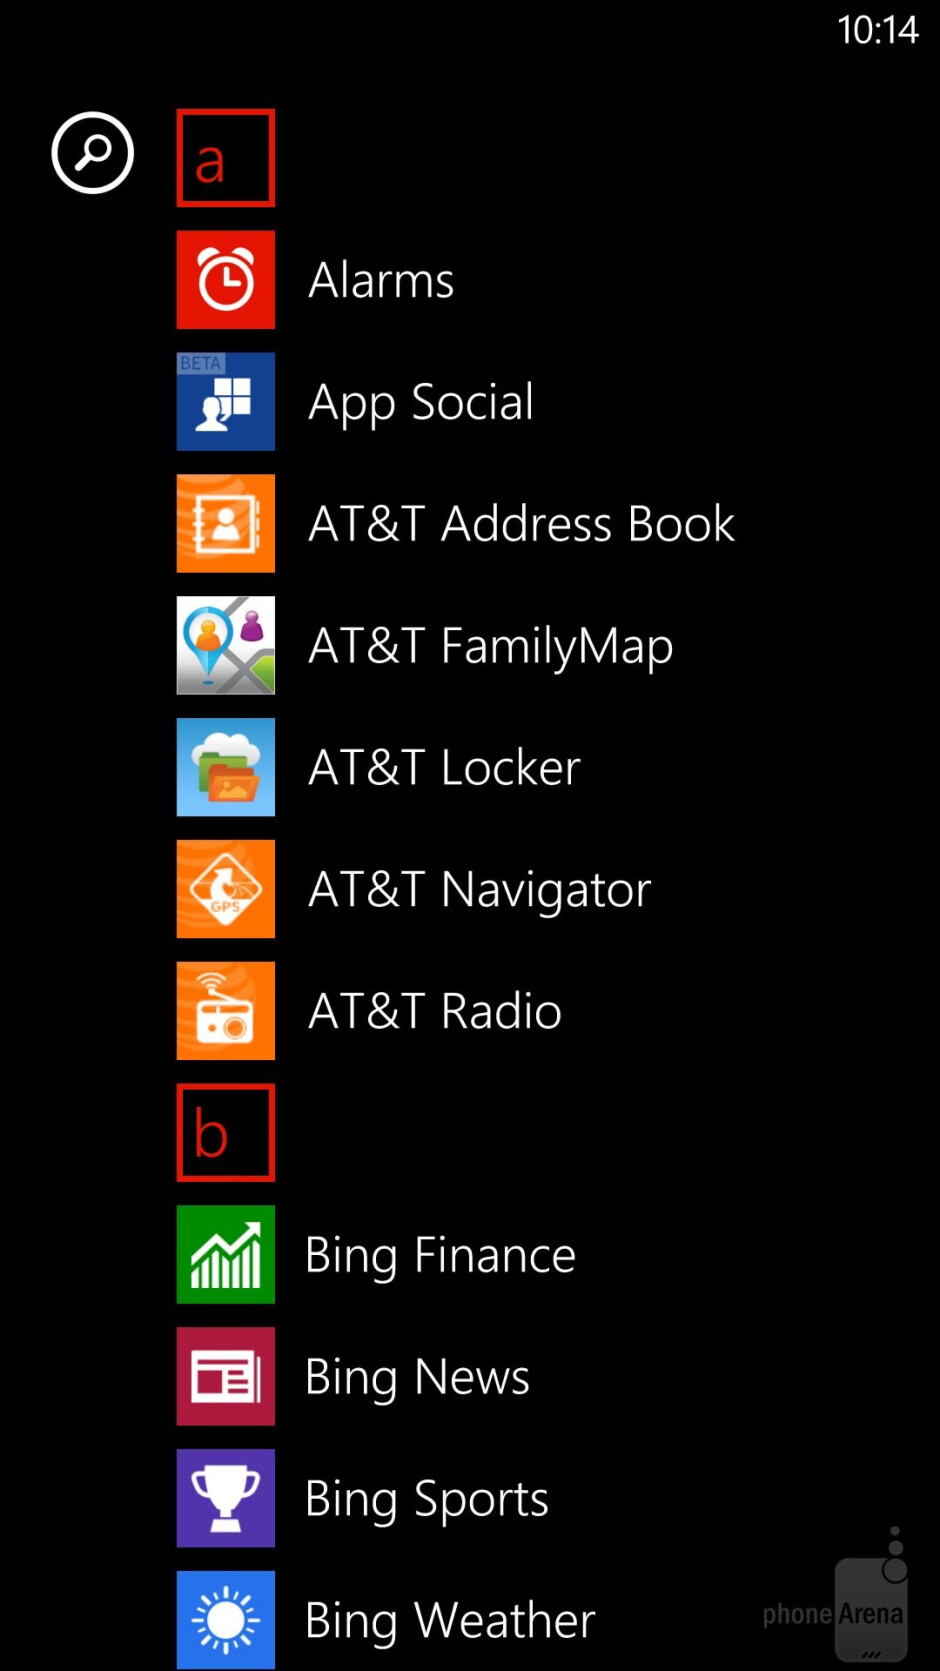 Interface of the Nokia Lumia 1520 - Samsung Galaxy S5 vs Nokia Lumia 1520